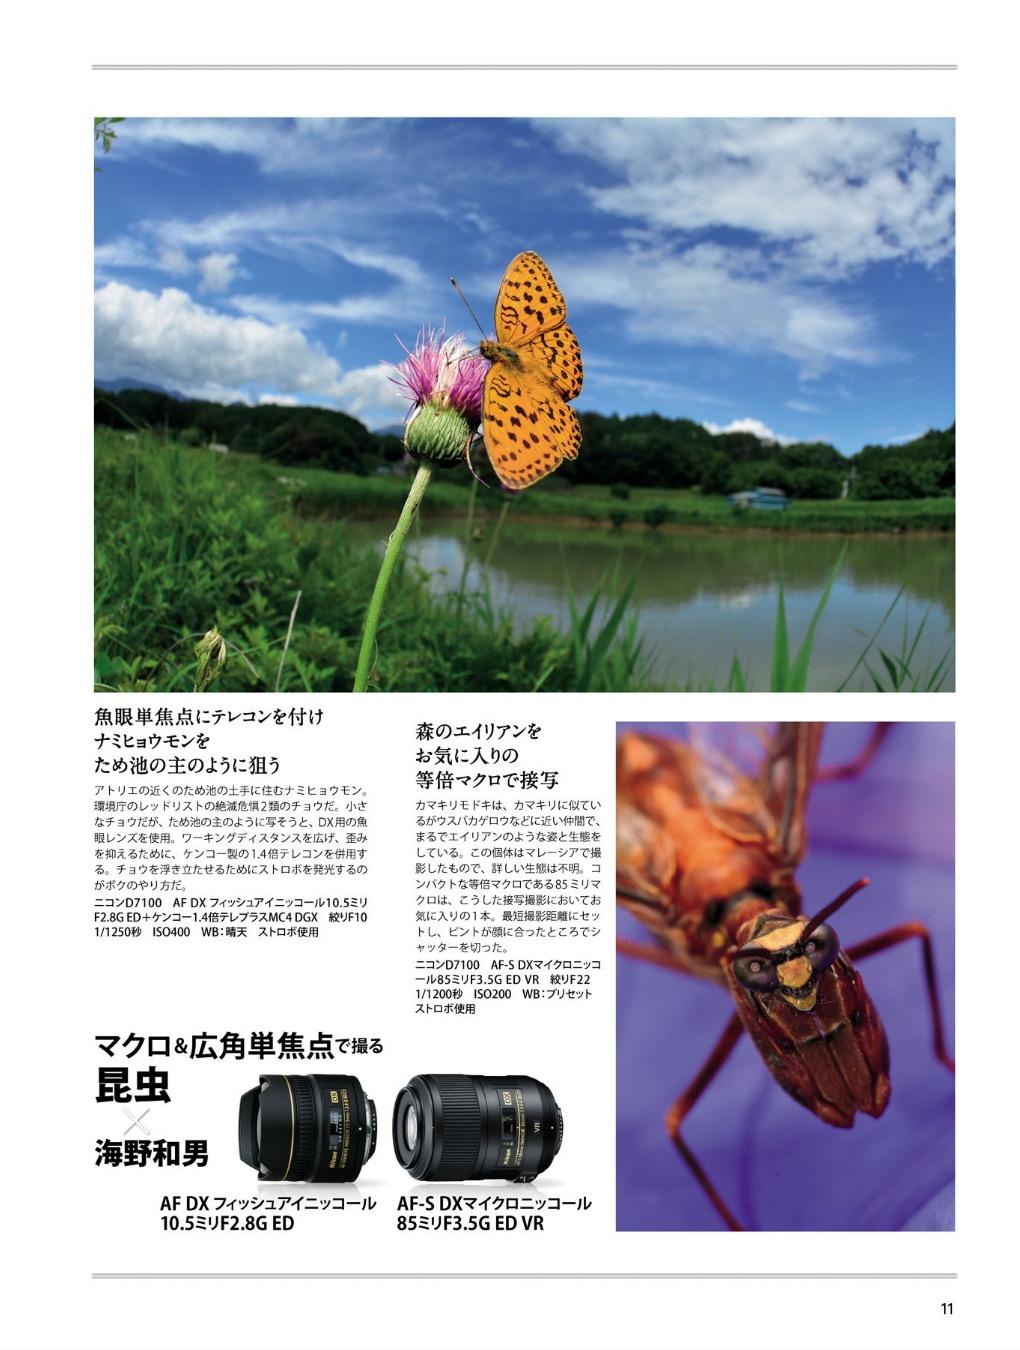 nikon-lens-guide-08